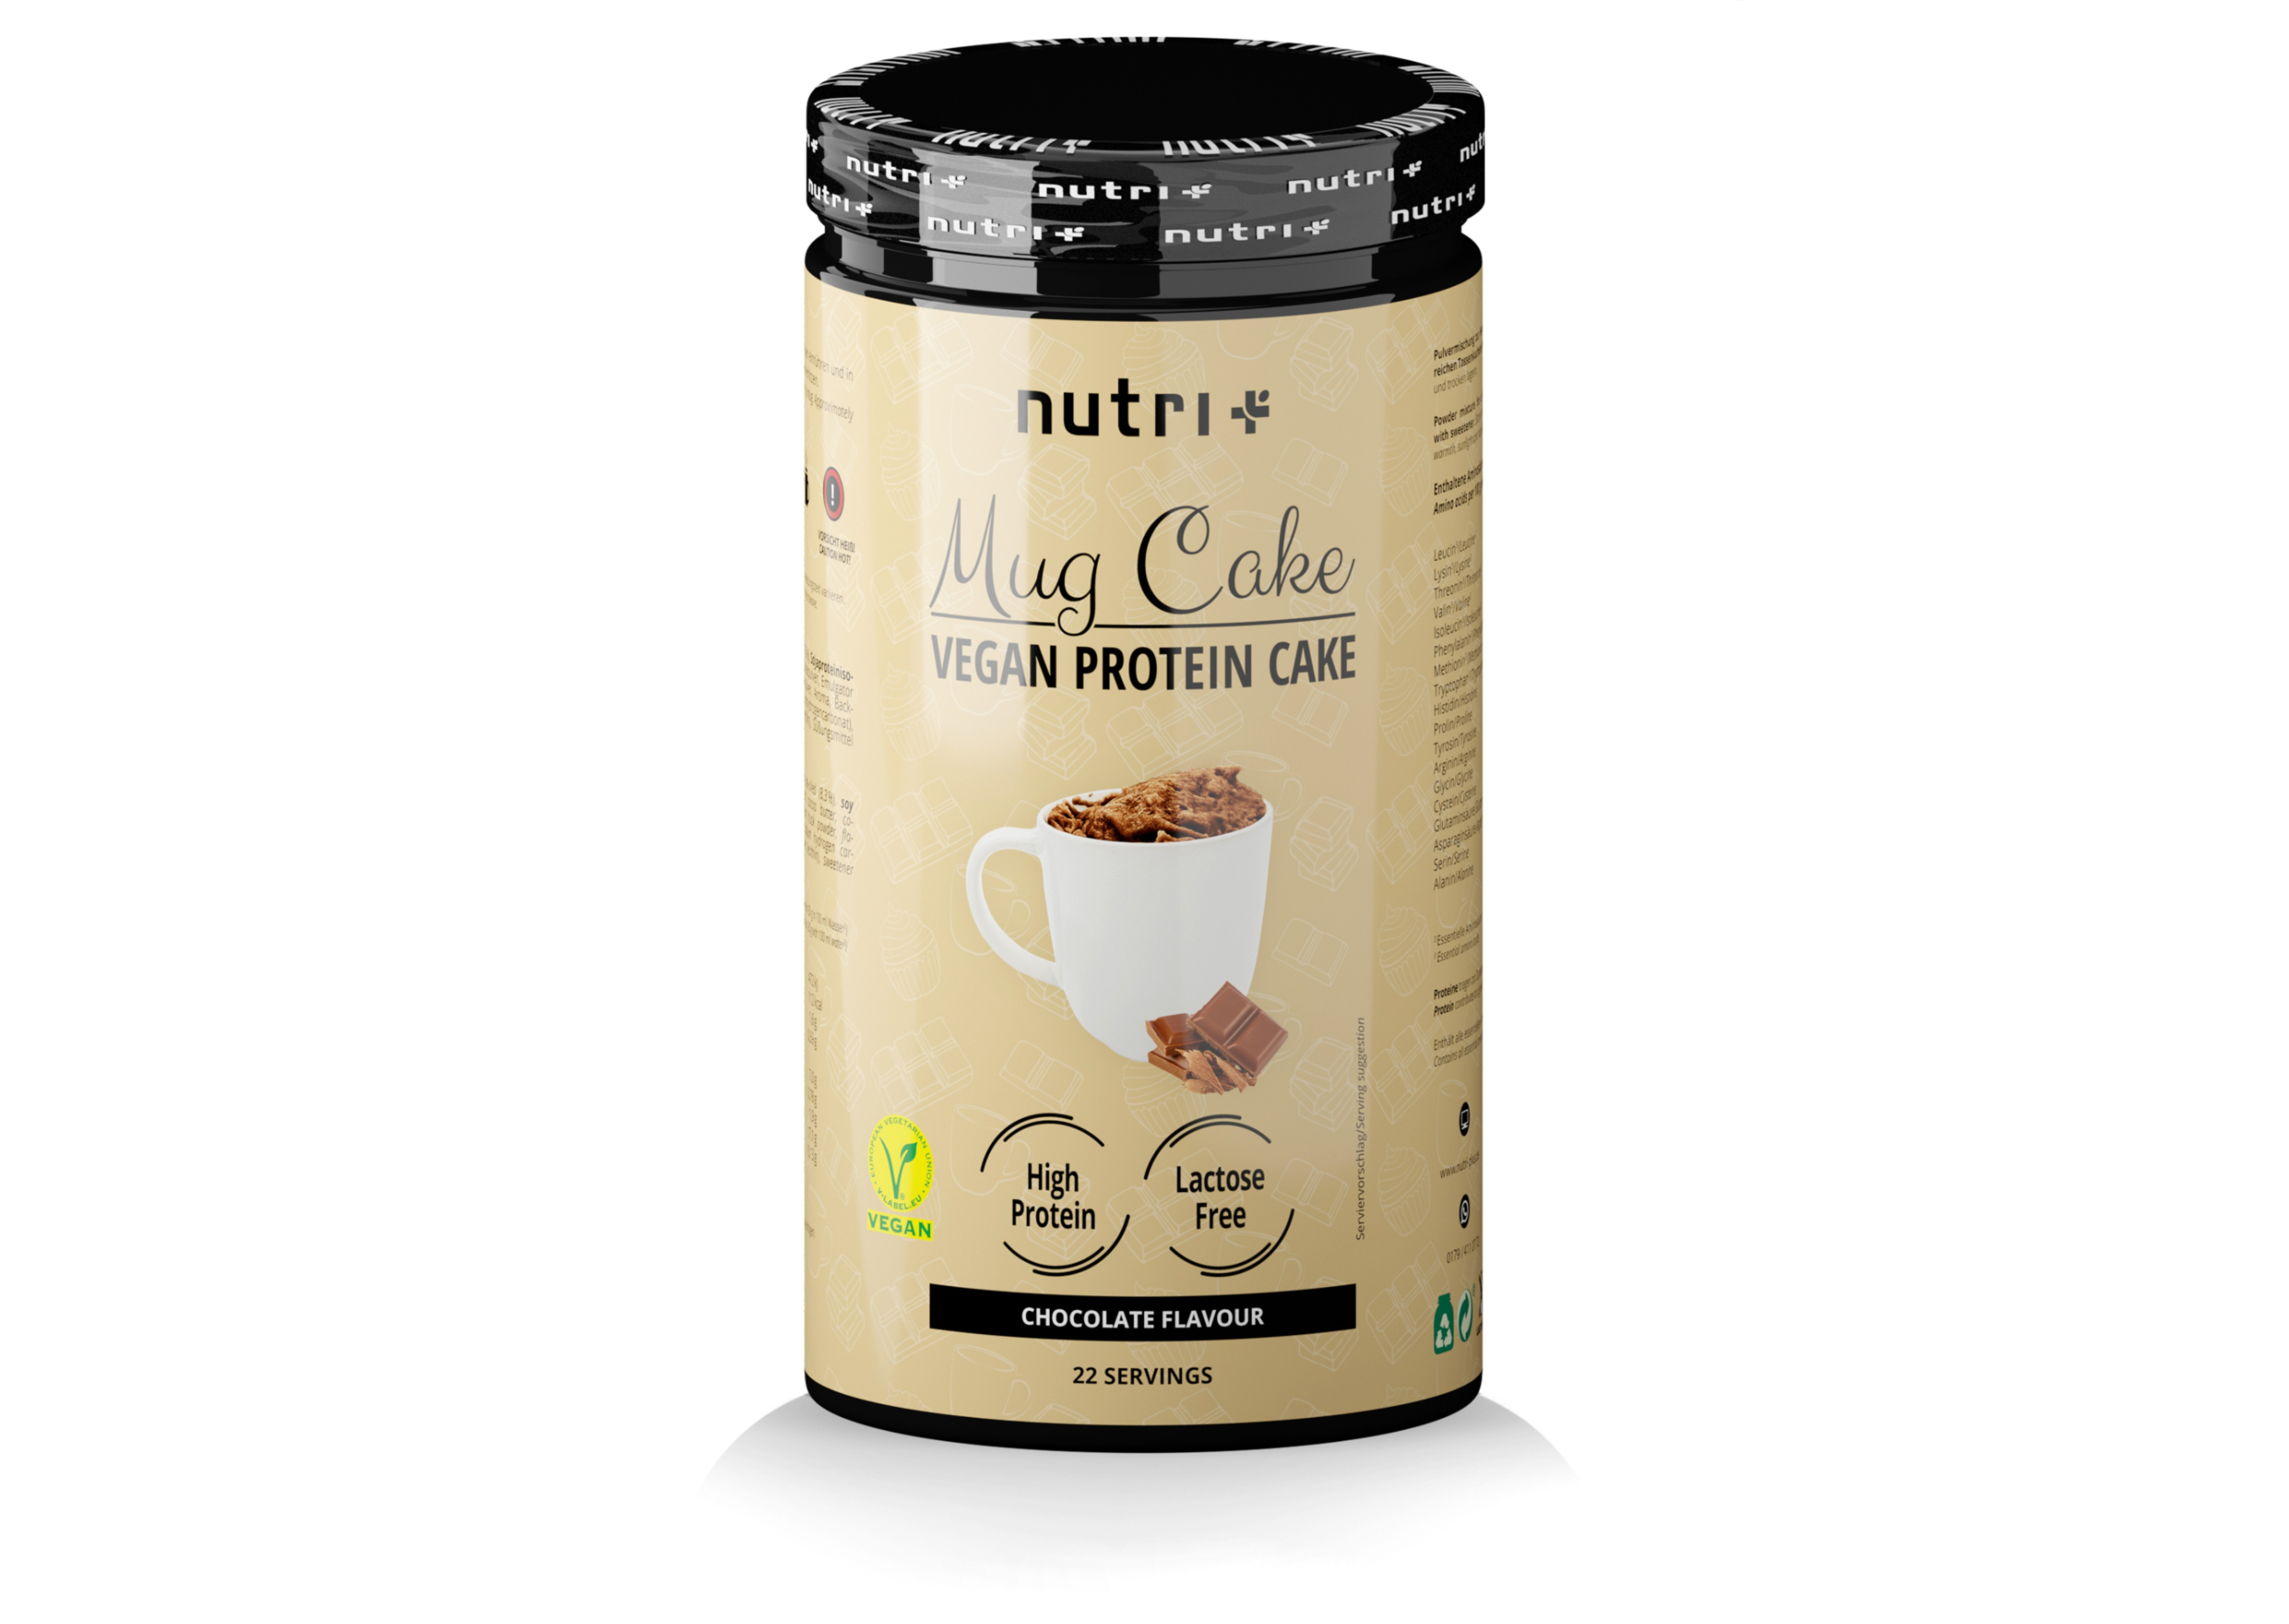 nutri+ Mug Cake - Vegan Protein-Tassenkuchen